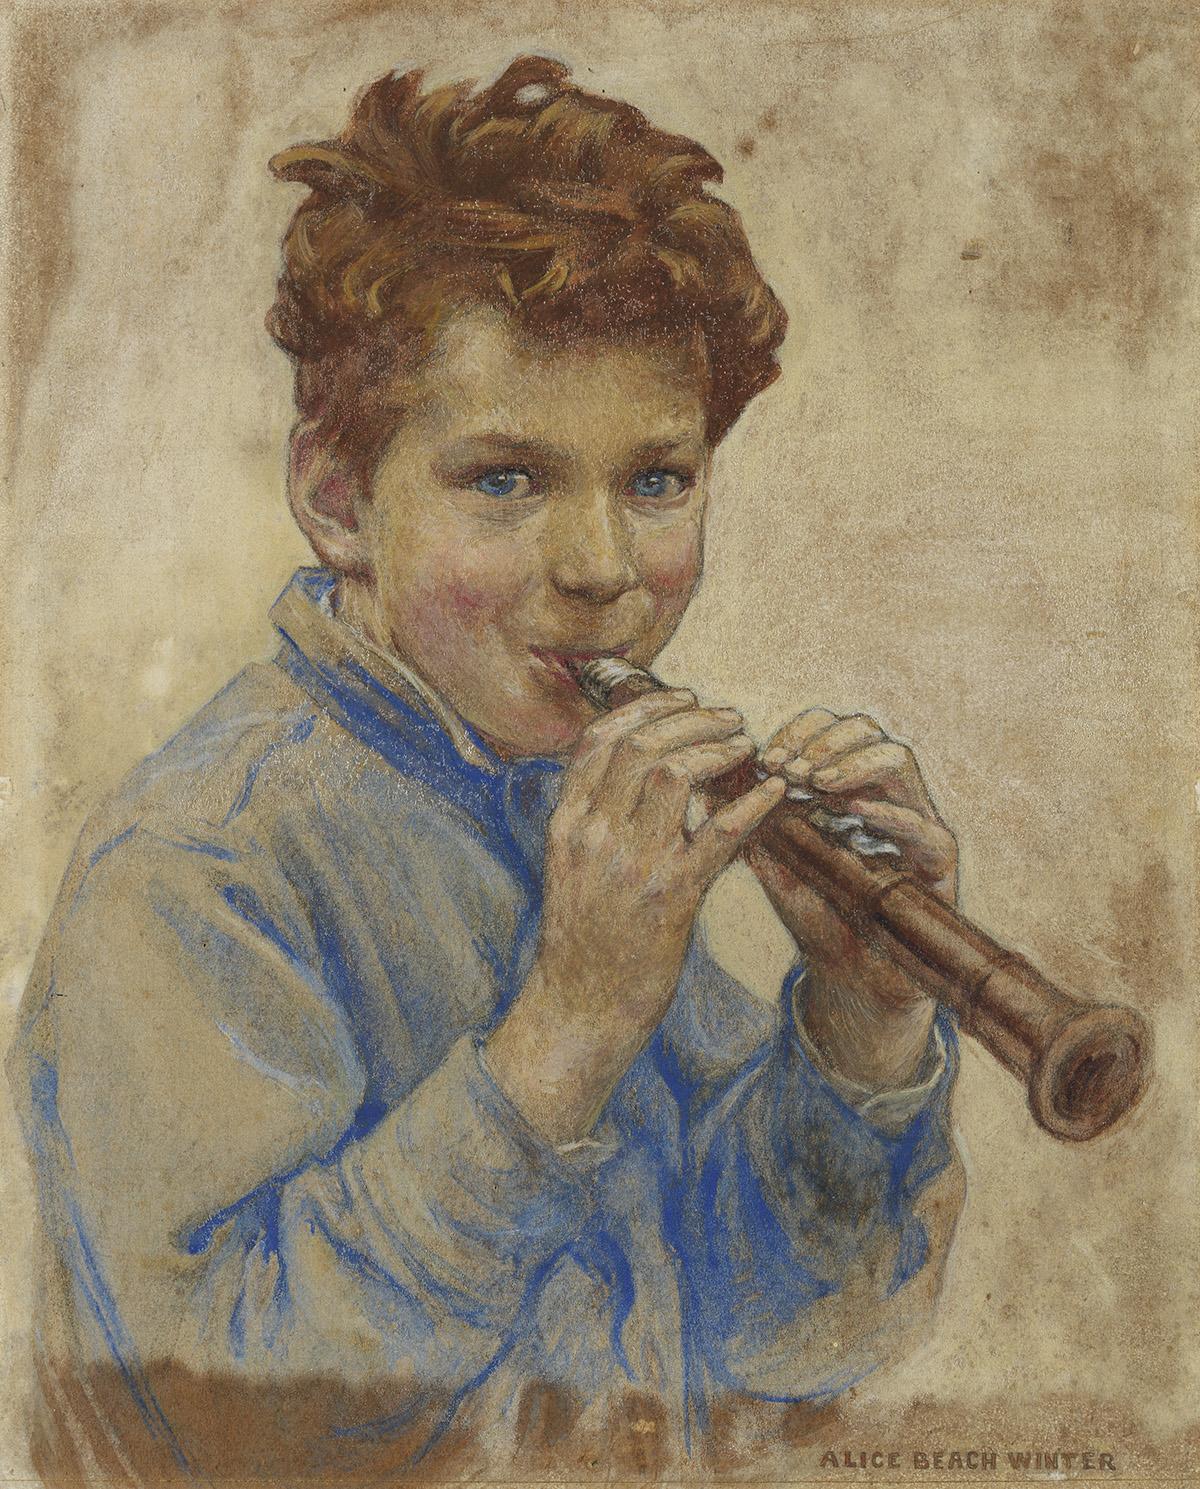 CHILDRENS ALICE BEACH WINTER. Boy with Clarinet.